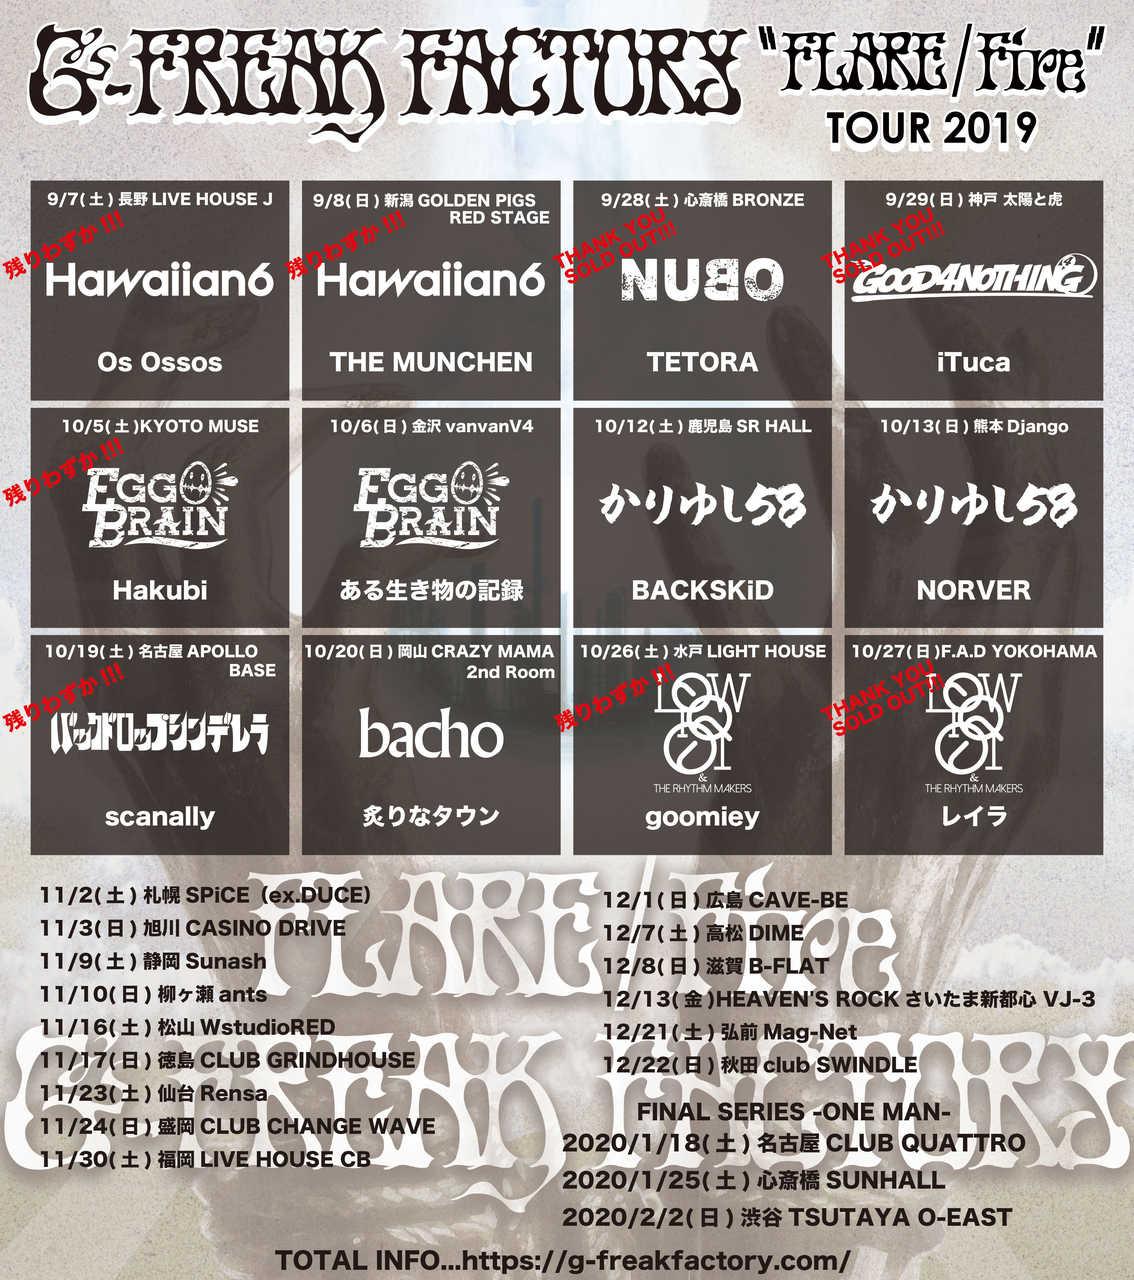 G-FREAK FACTORY 最新Sg「FLARE/Fire」リリースツアー10月公演のゲストバンド決定!!